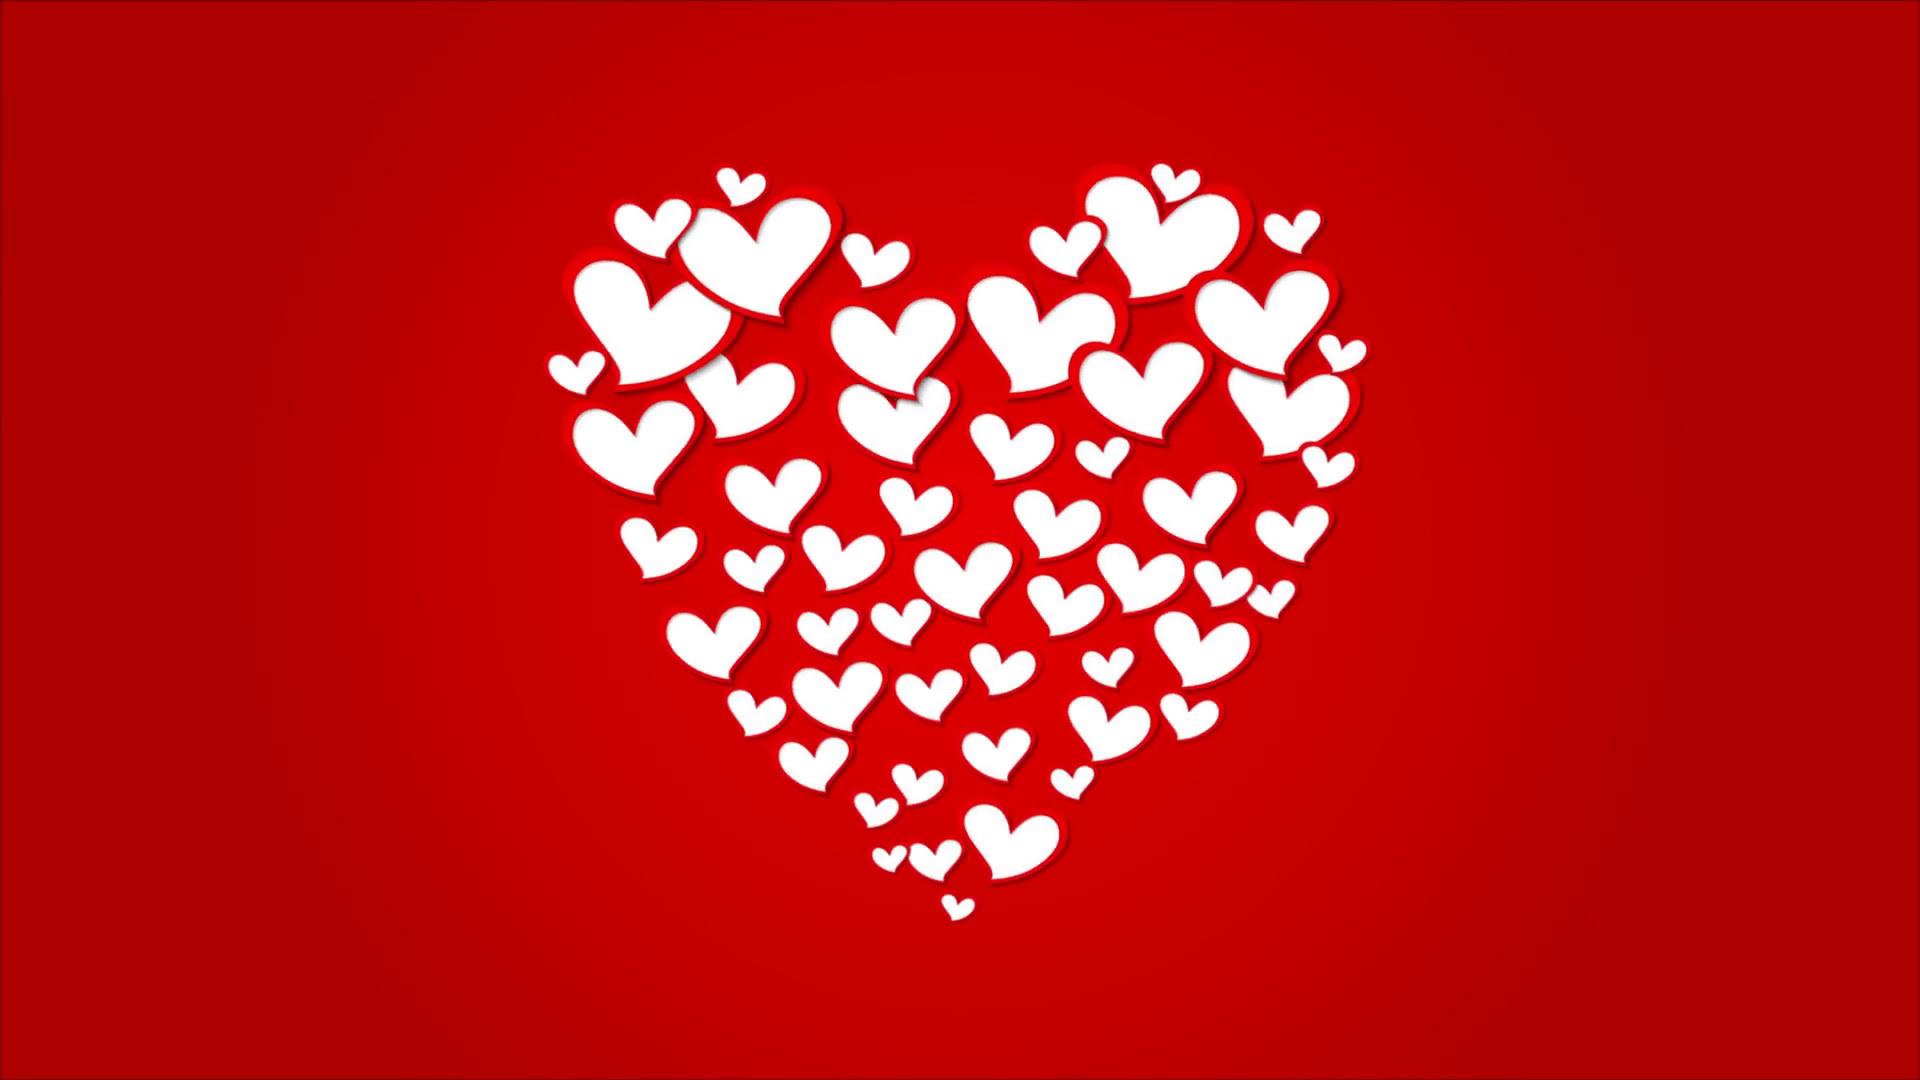 Valentine Backgrounds 50  images